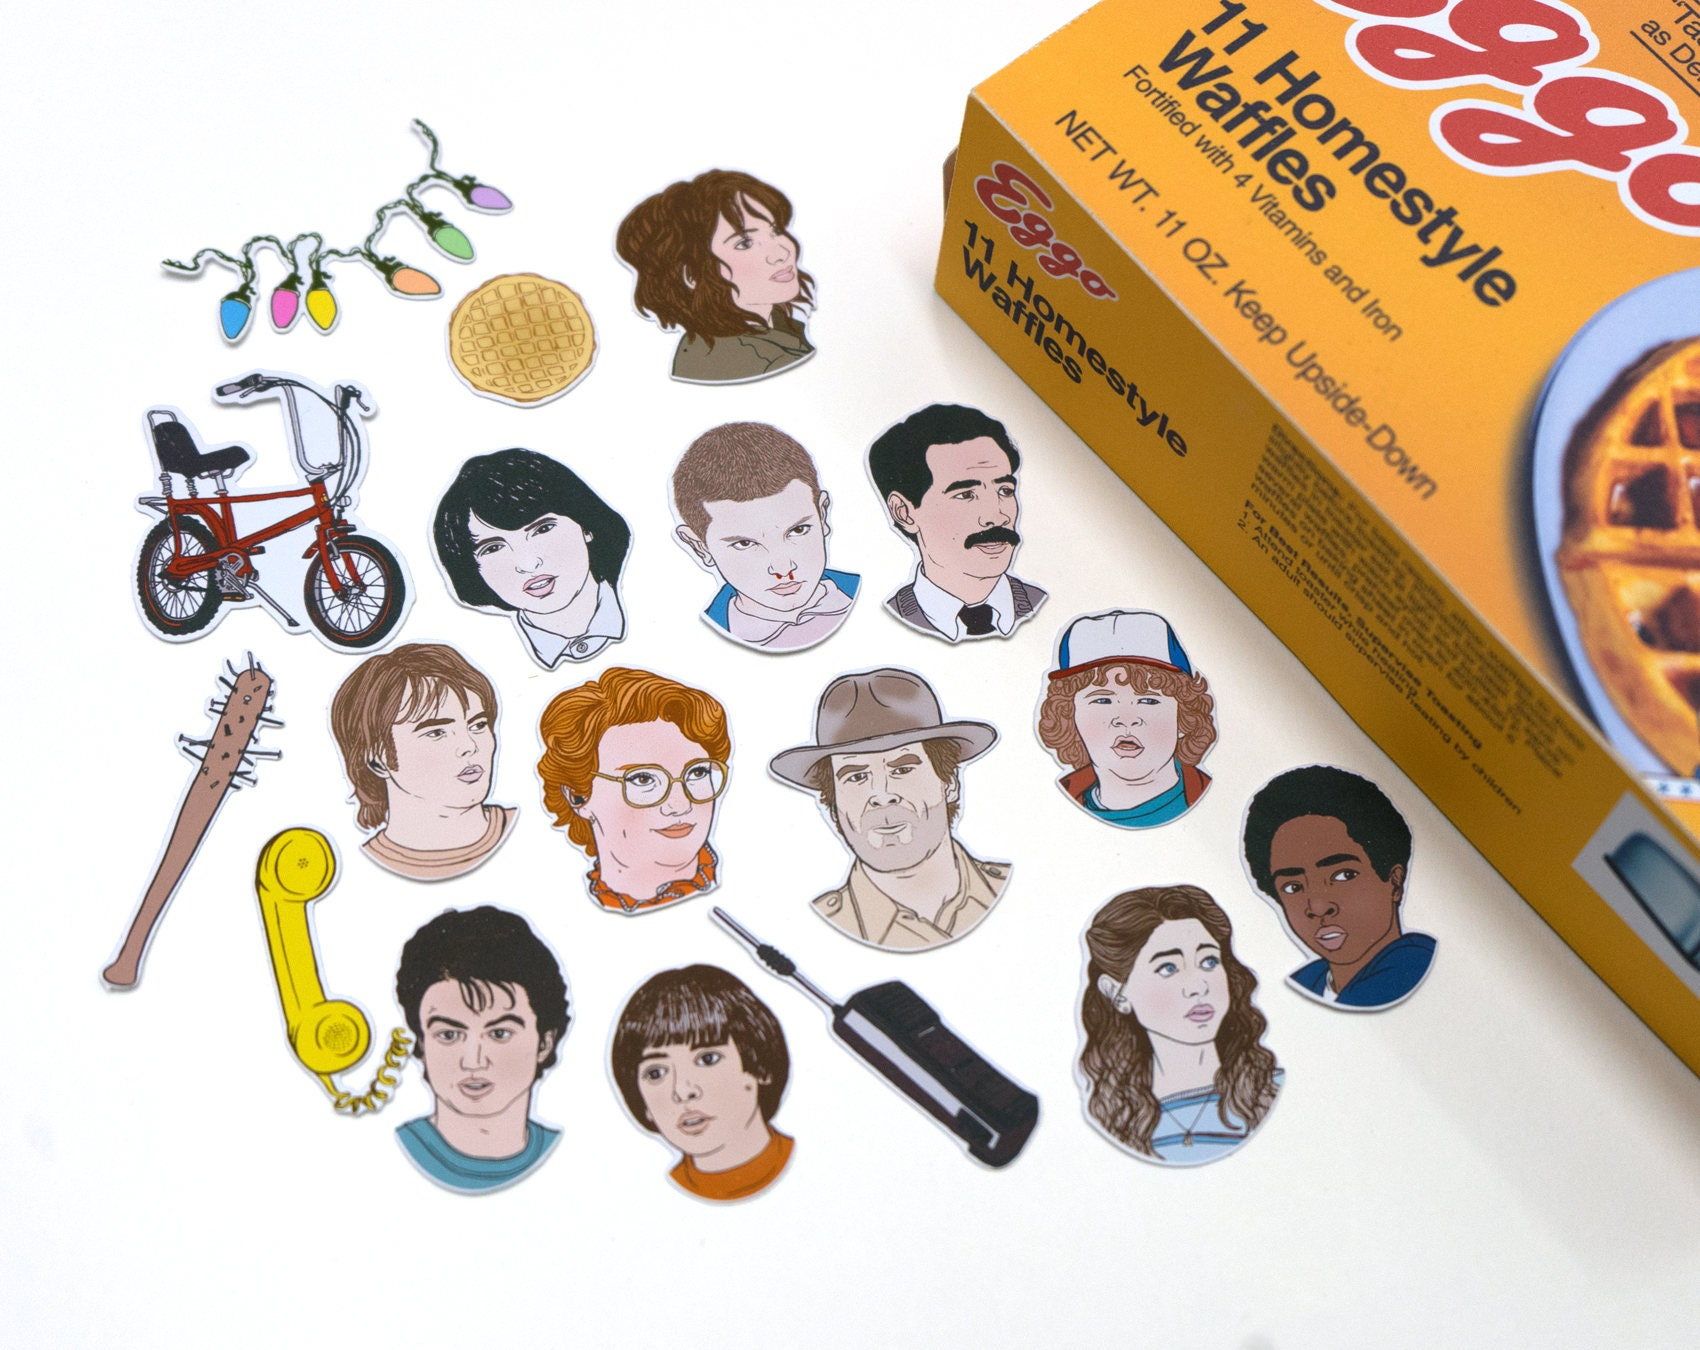 Stranger Things Stickers & Magnets vinyl stickers fridge